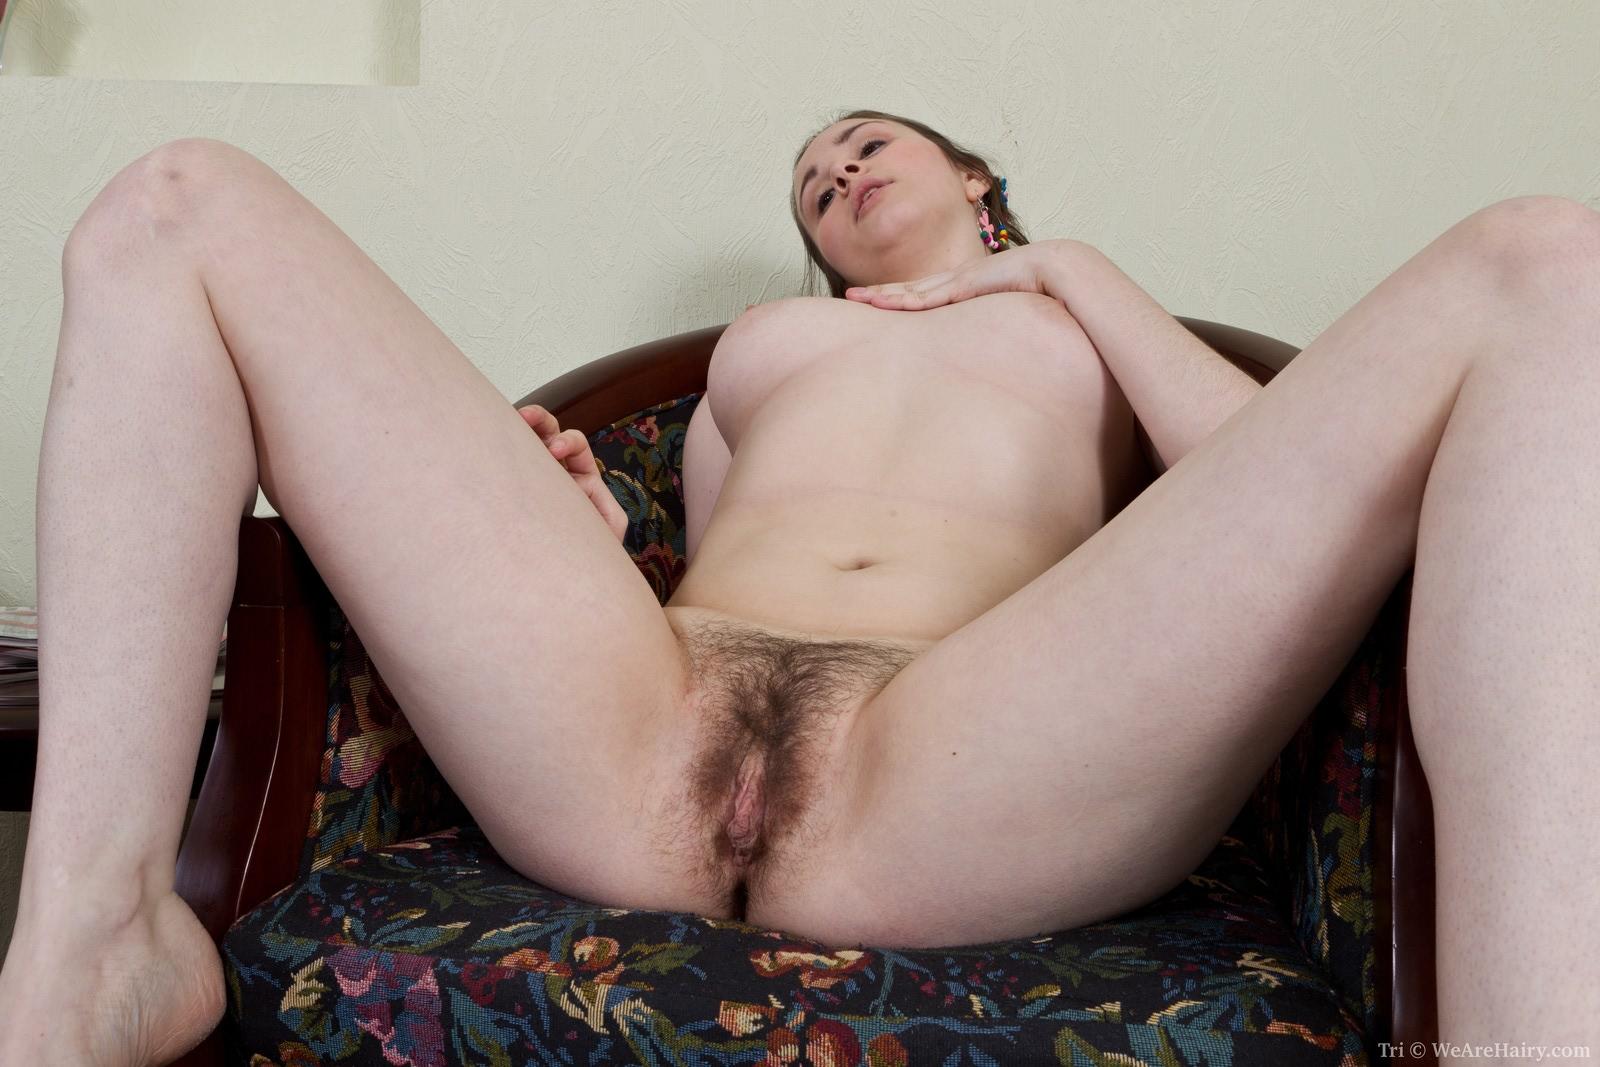 Teendwarf tits and hairy pussy pics adult pics